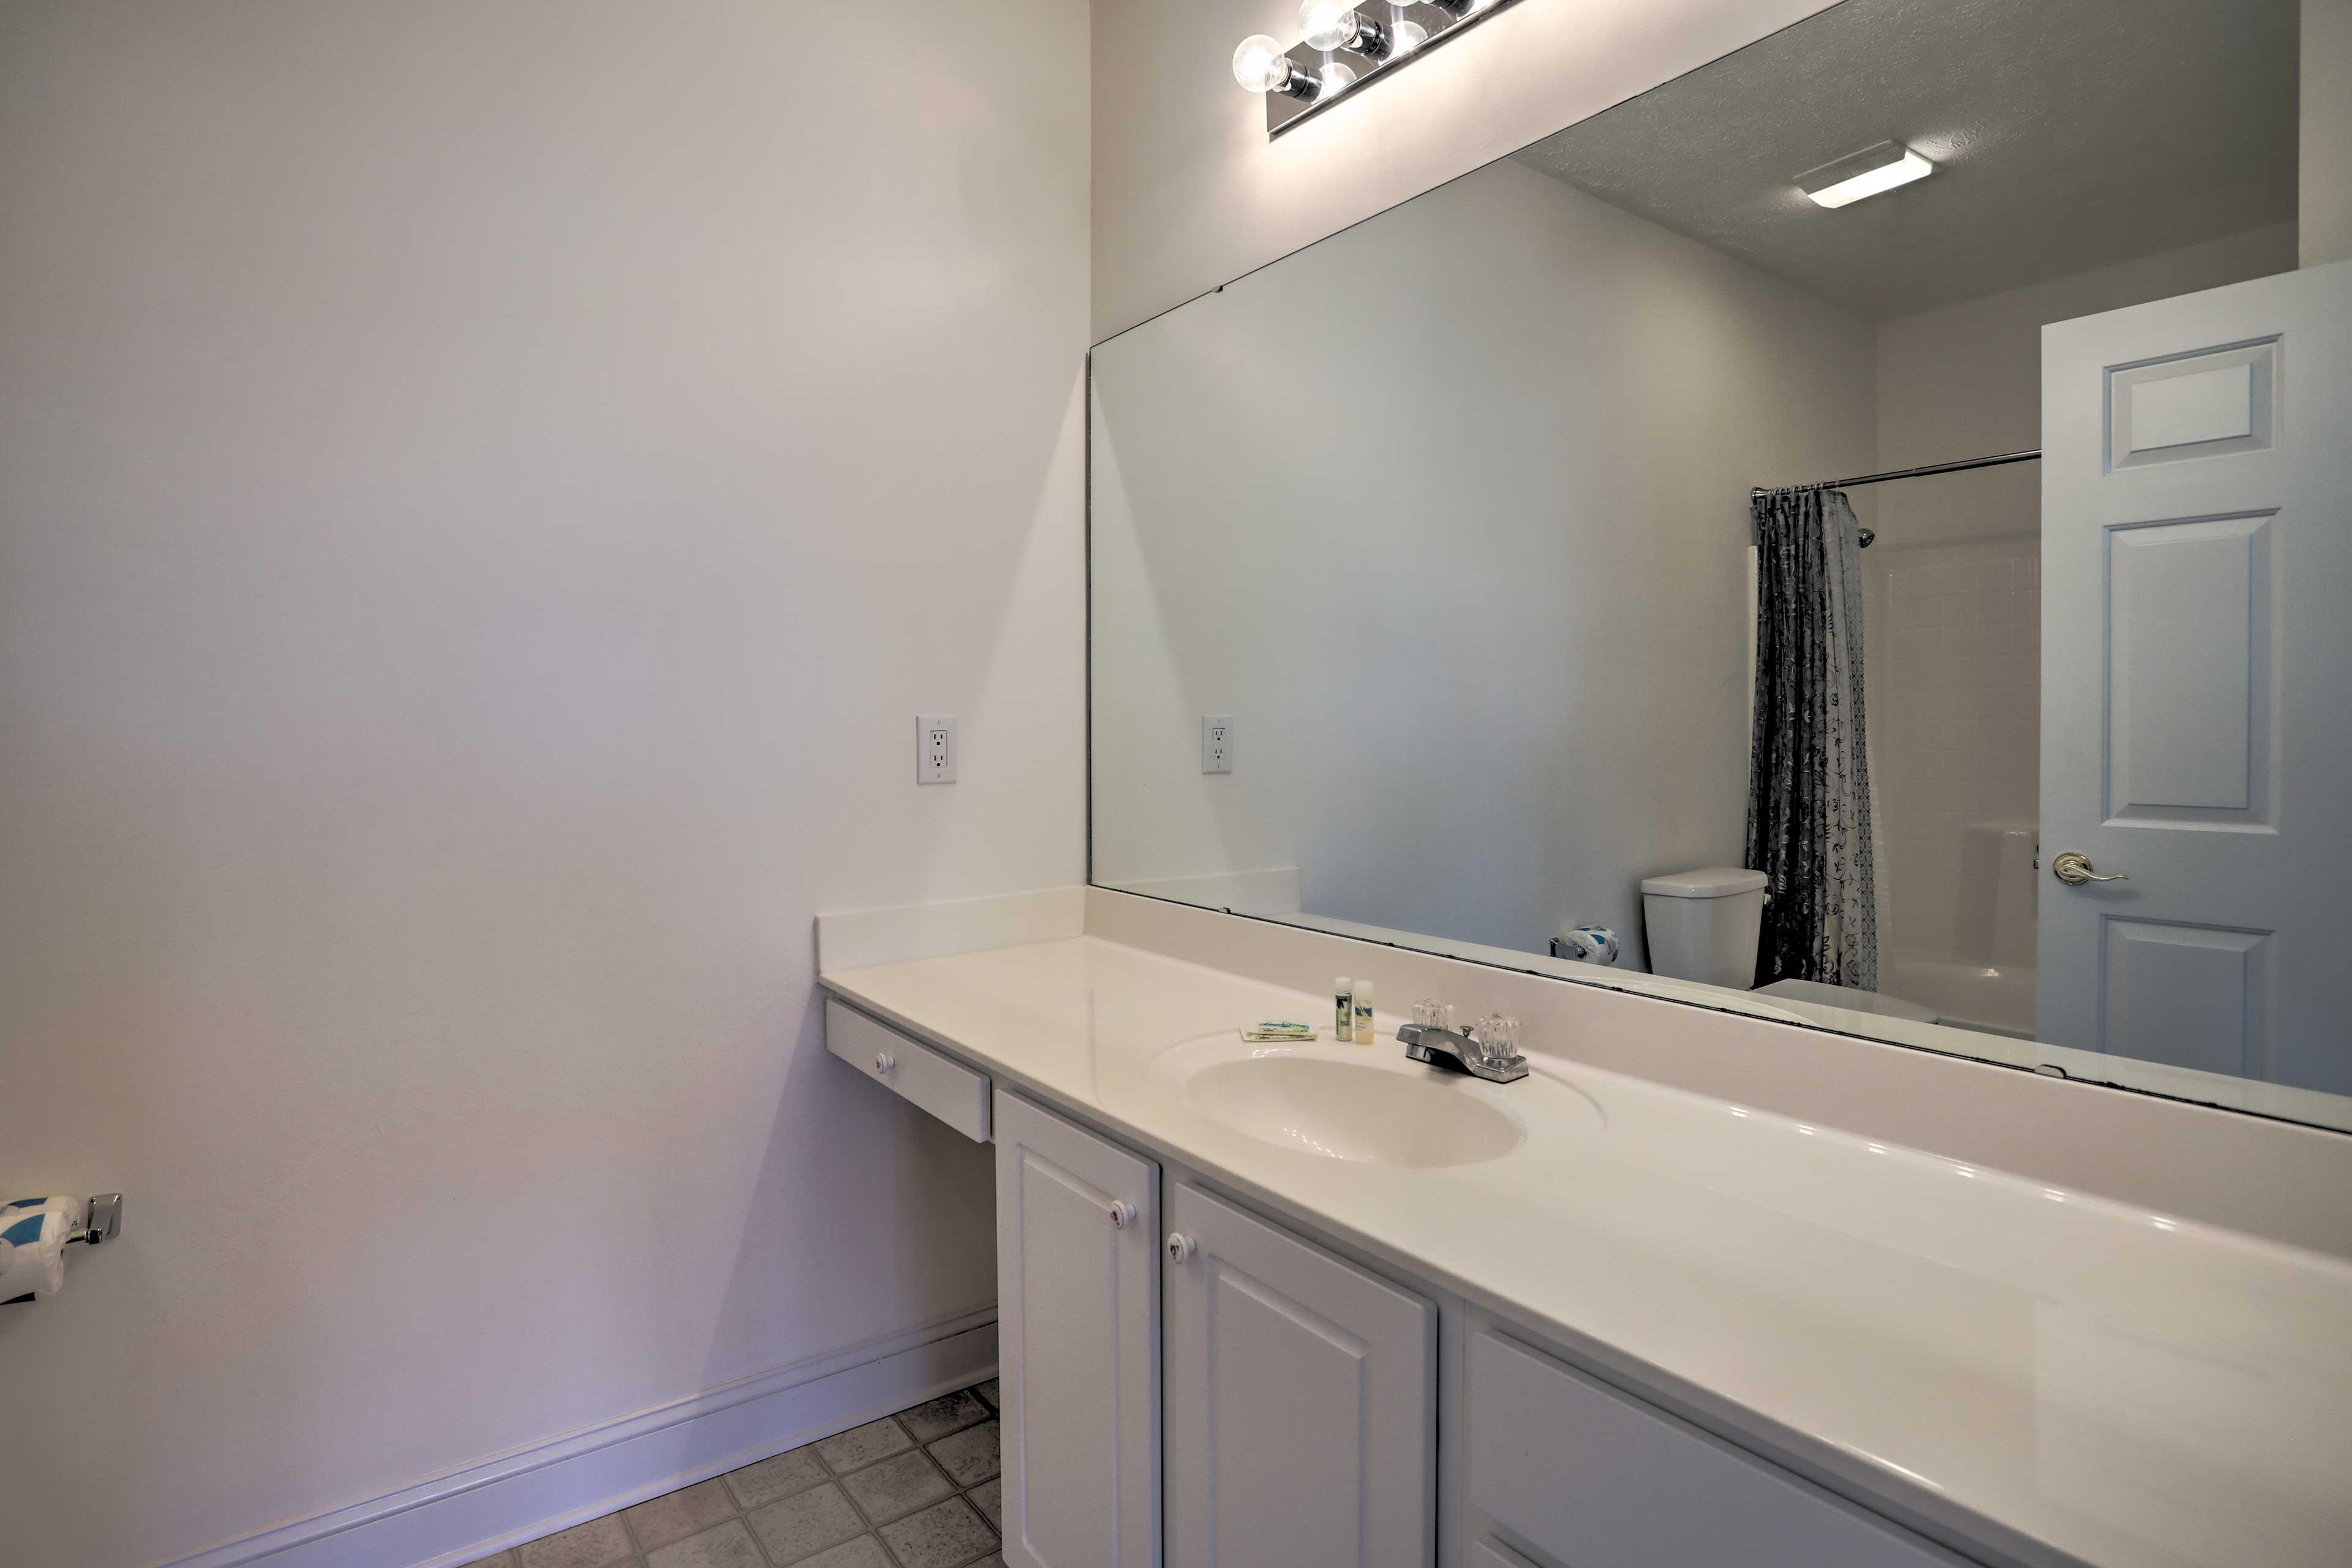 The en-suite bathroom has a spacious vanity.